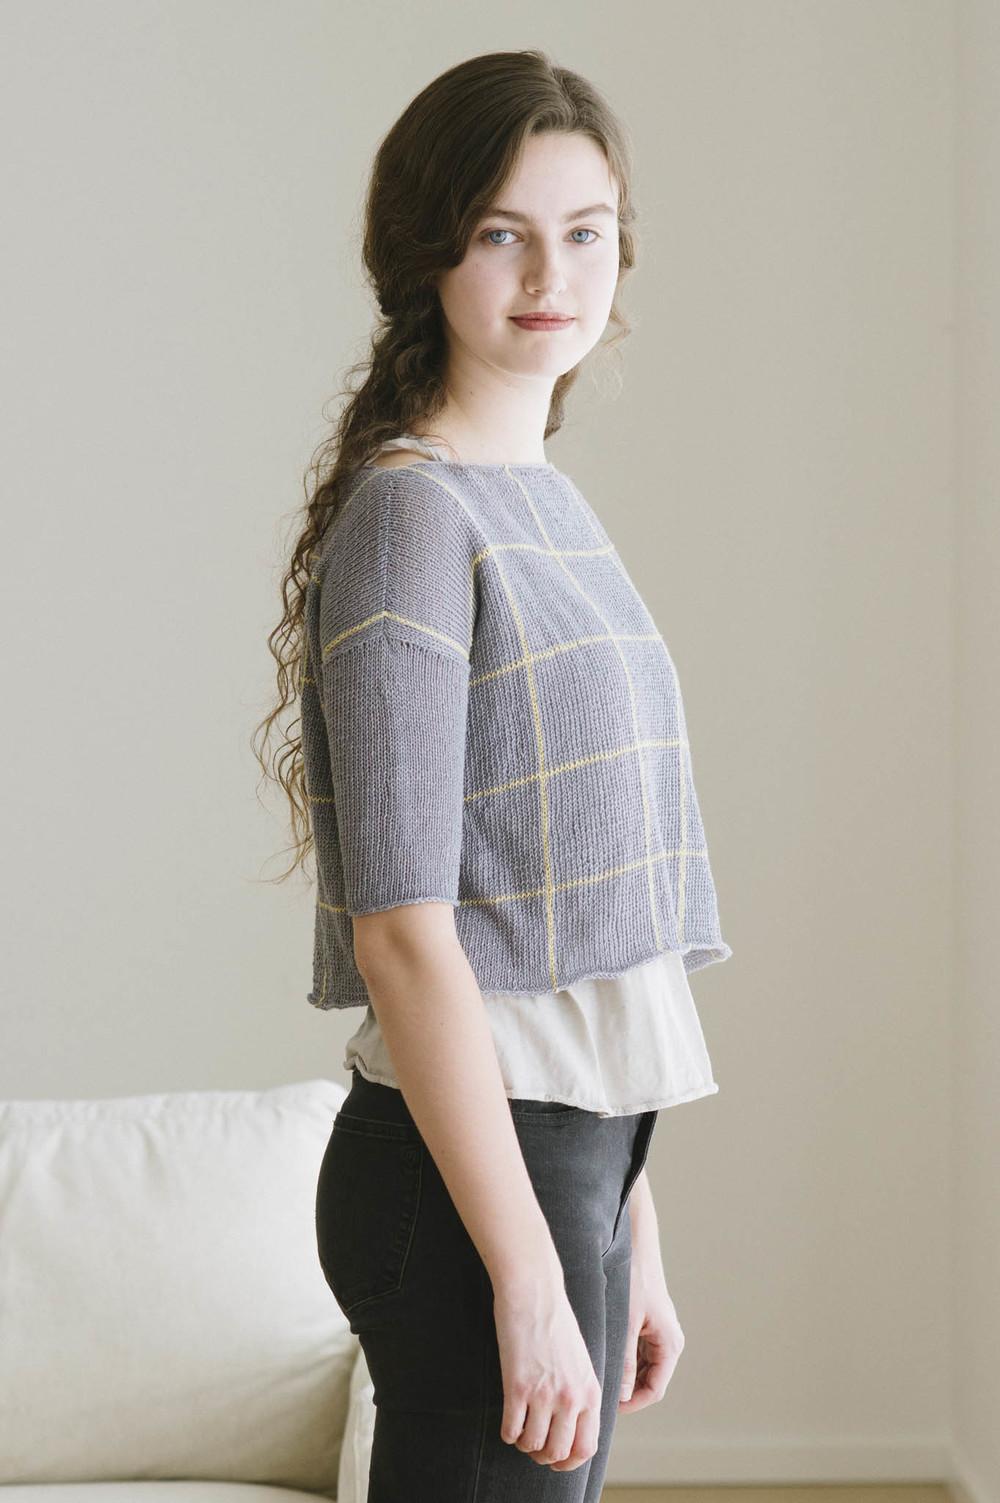 quince-co-zara-dianna-walla-knitting-pattern-sparrow-2.jpg